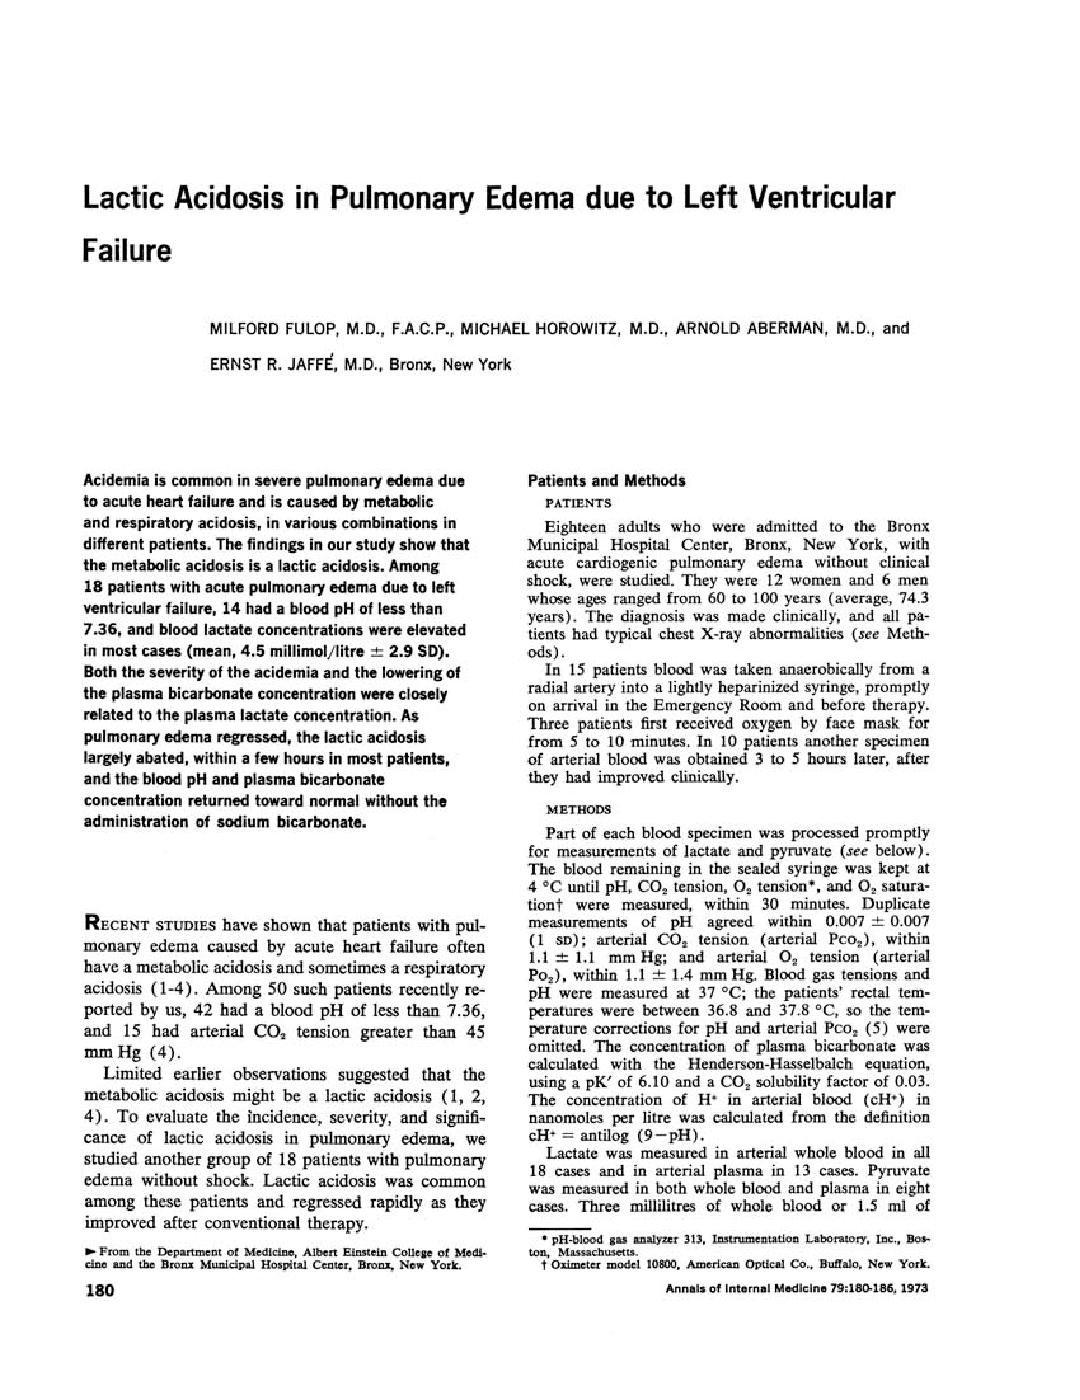 Lactic Acidosis In Pulmonary Edema Due To Left Ventricular Failure